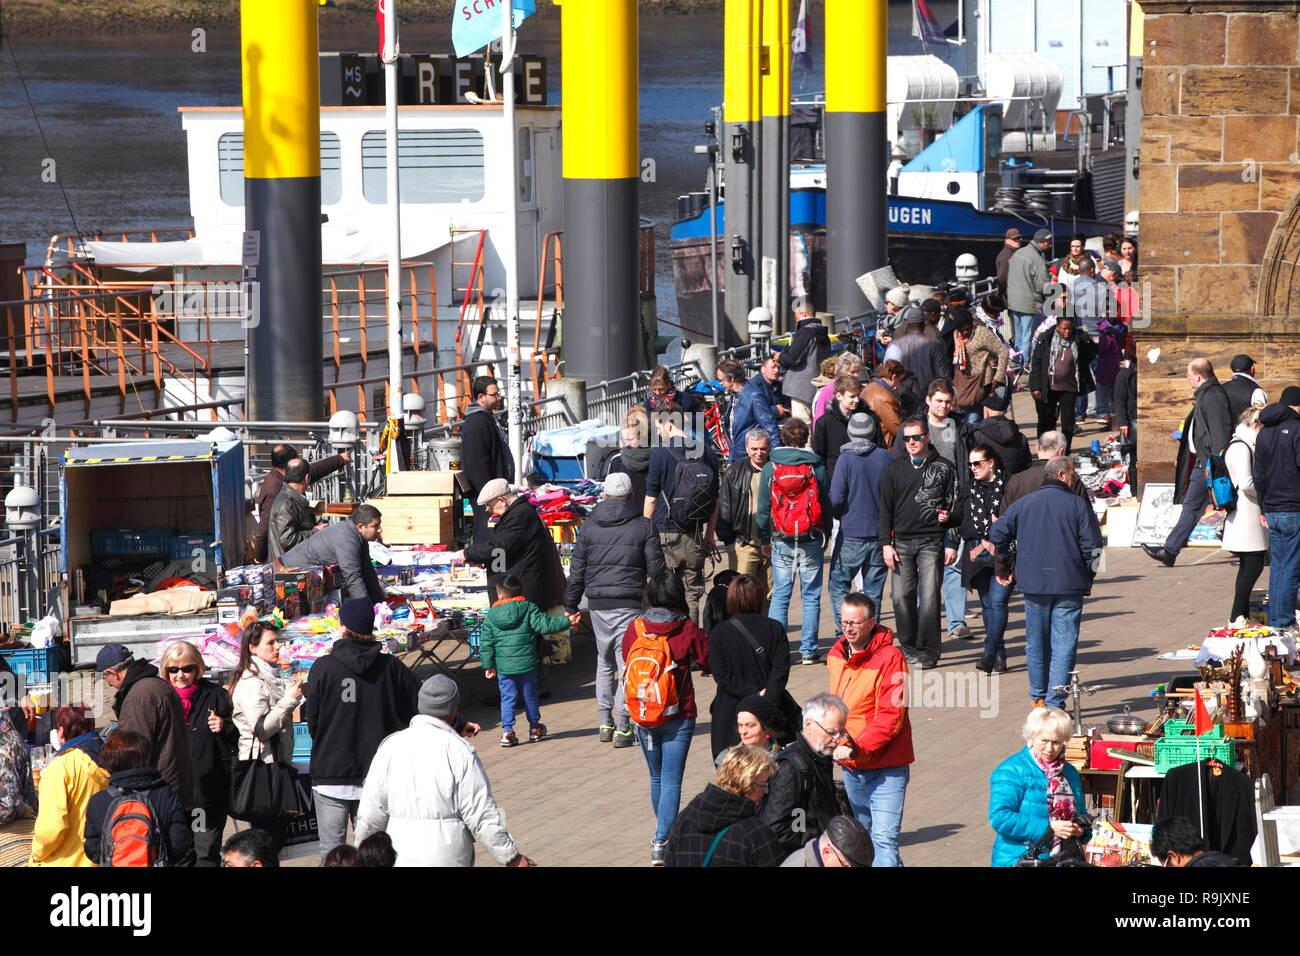 Bremen flea market Kajenmarkt, market stalls, at Schlachte and Weser, Bremen, Germany, Europe  I Bremer Flohmarkt Kajenmarkt, Marktstände, an Schlacht - Stock Image